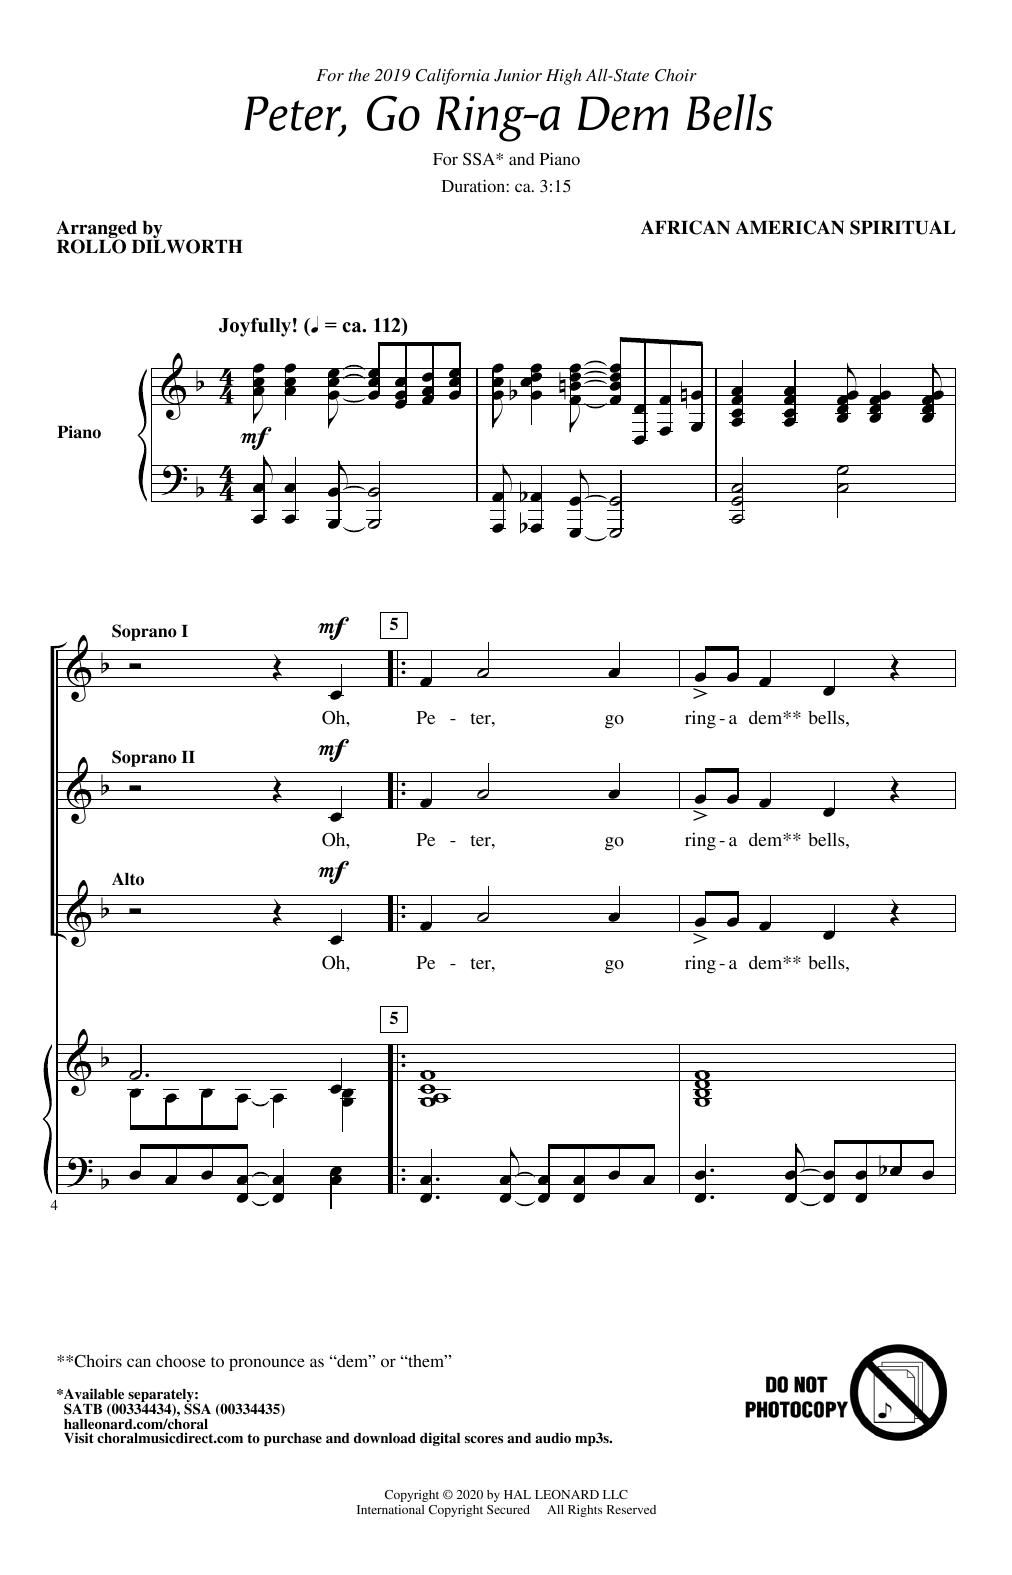 Peter Go Ring-A Dem Bells (arr. Rollo Dilworth) (SSA Choir)